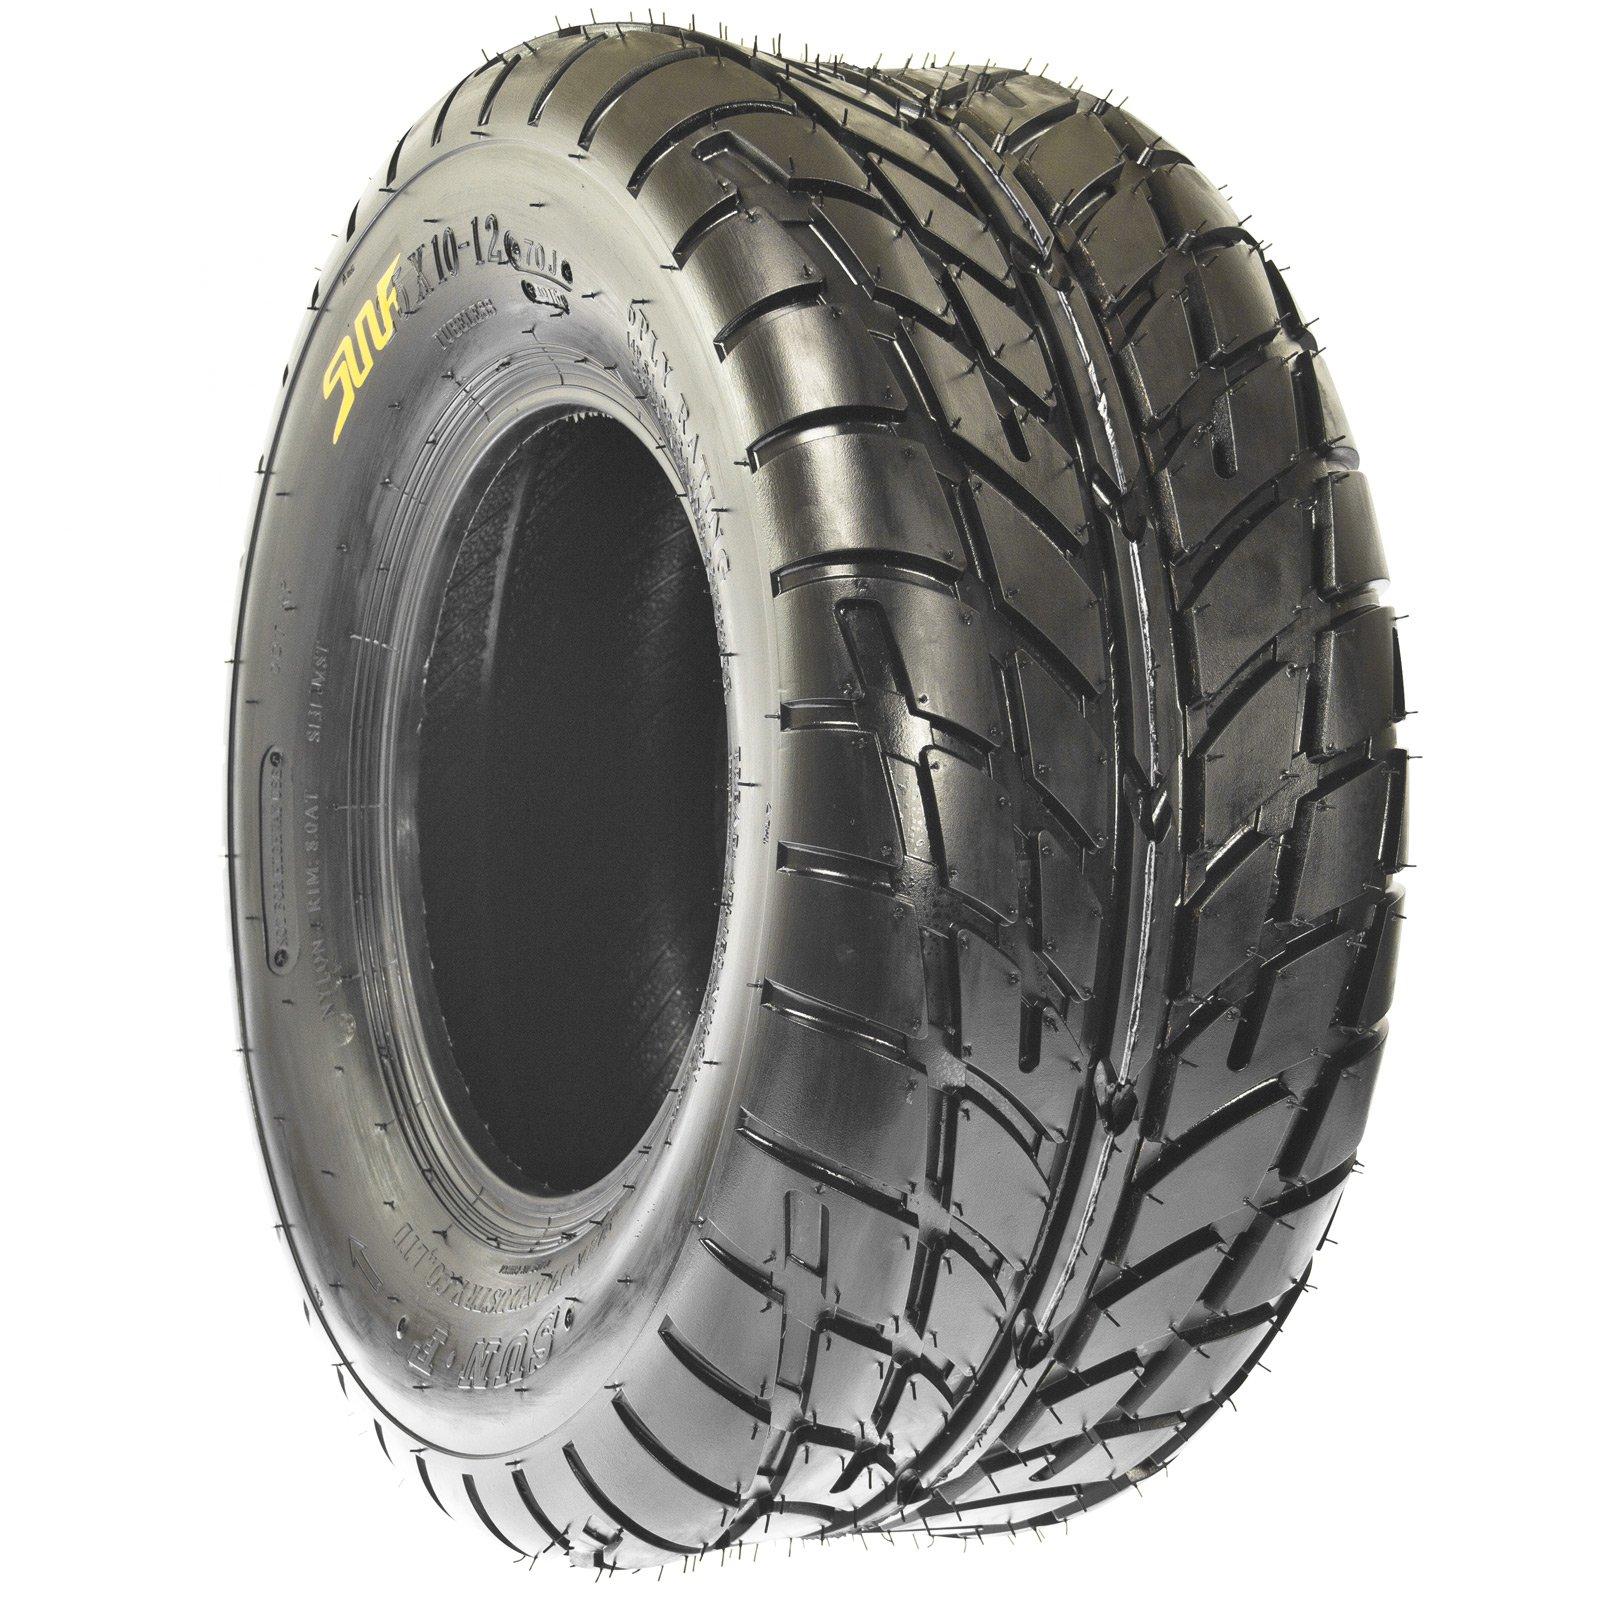 SunF Quad ATV Road Race Tires 225/45-10 225 45 10 4 PR A021 (Full set of 4) by SunF (Image #7)